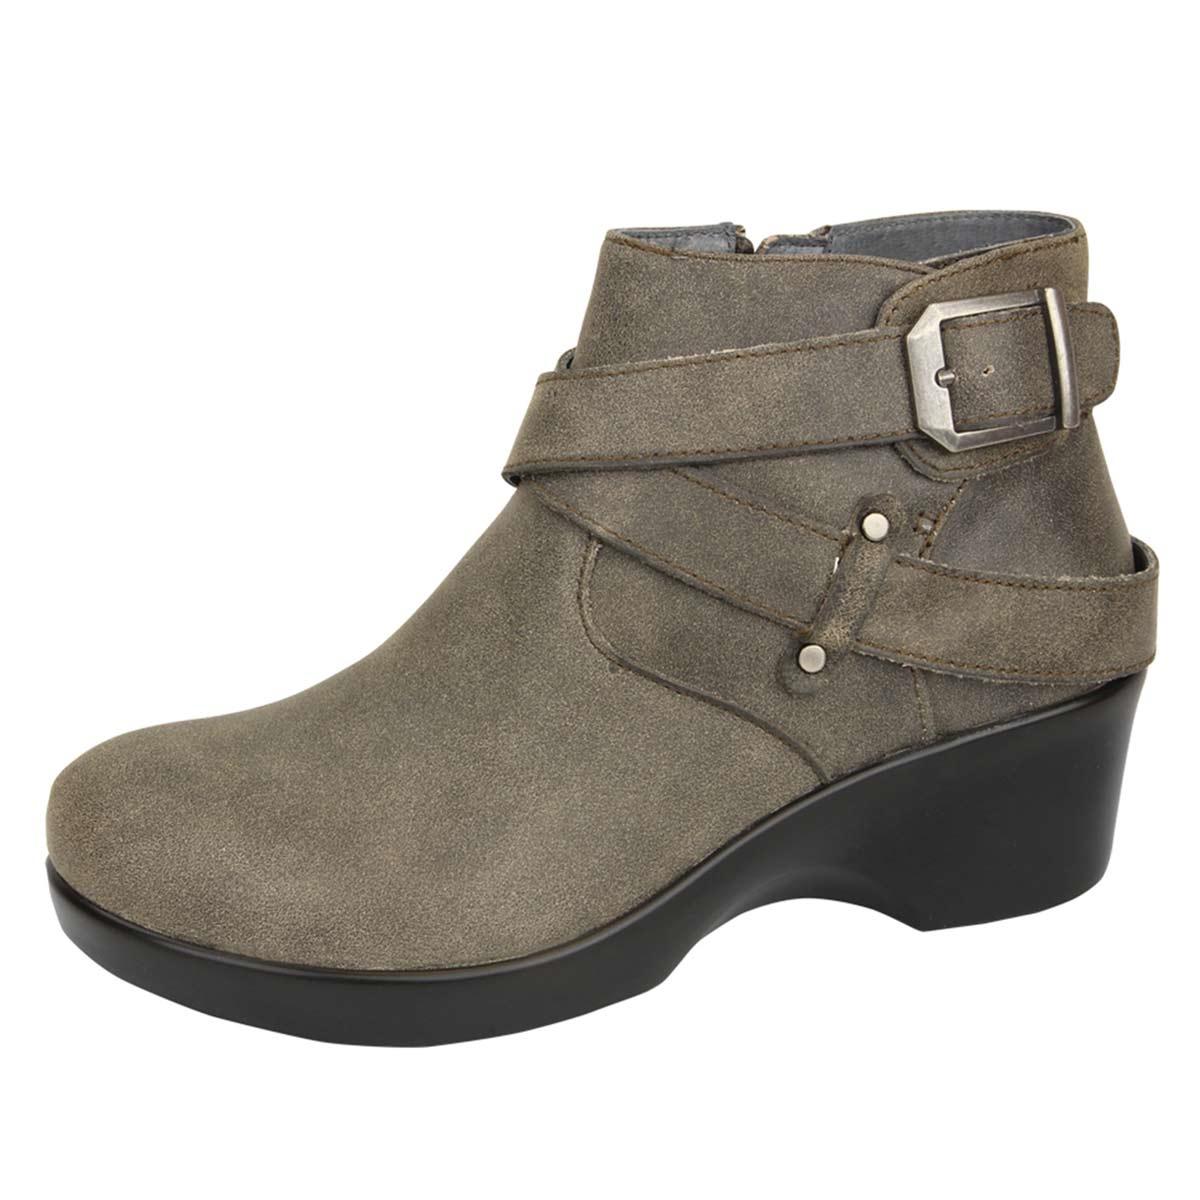 Alegria Shoes Eva Drifted Boots Alegria Free Shipping